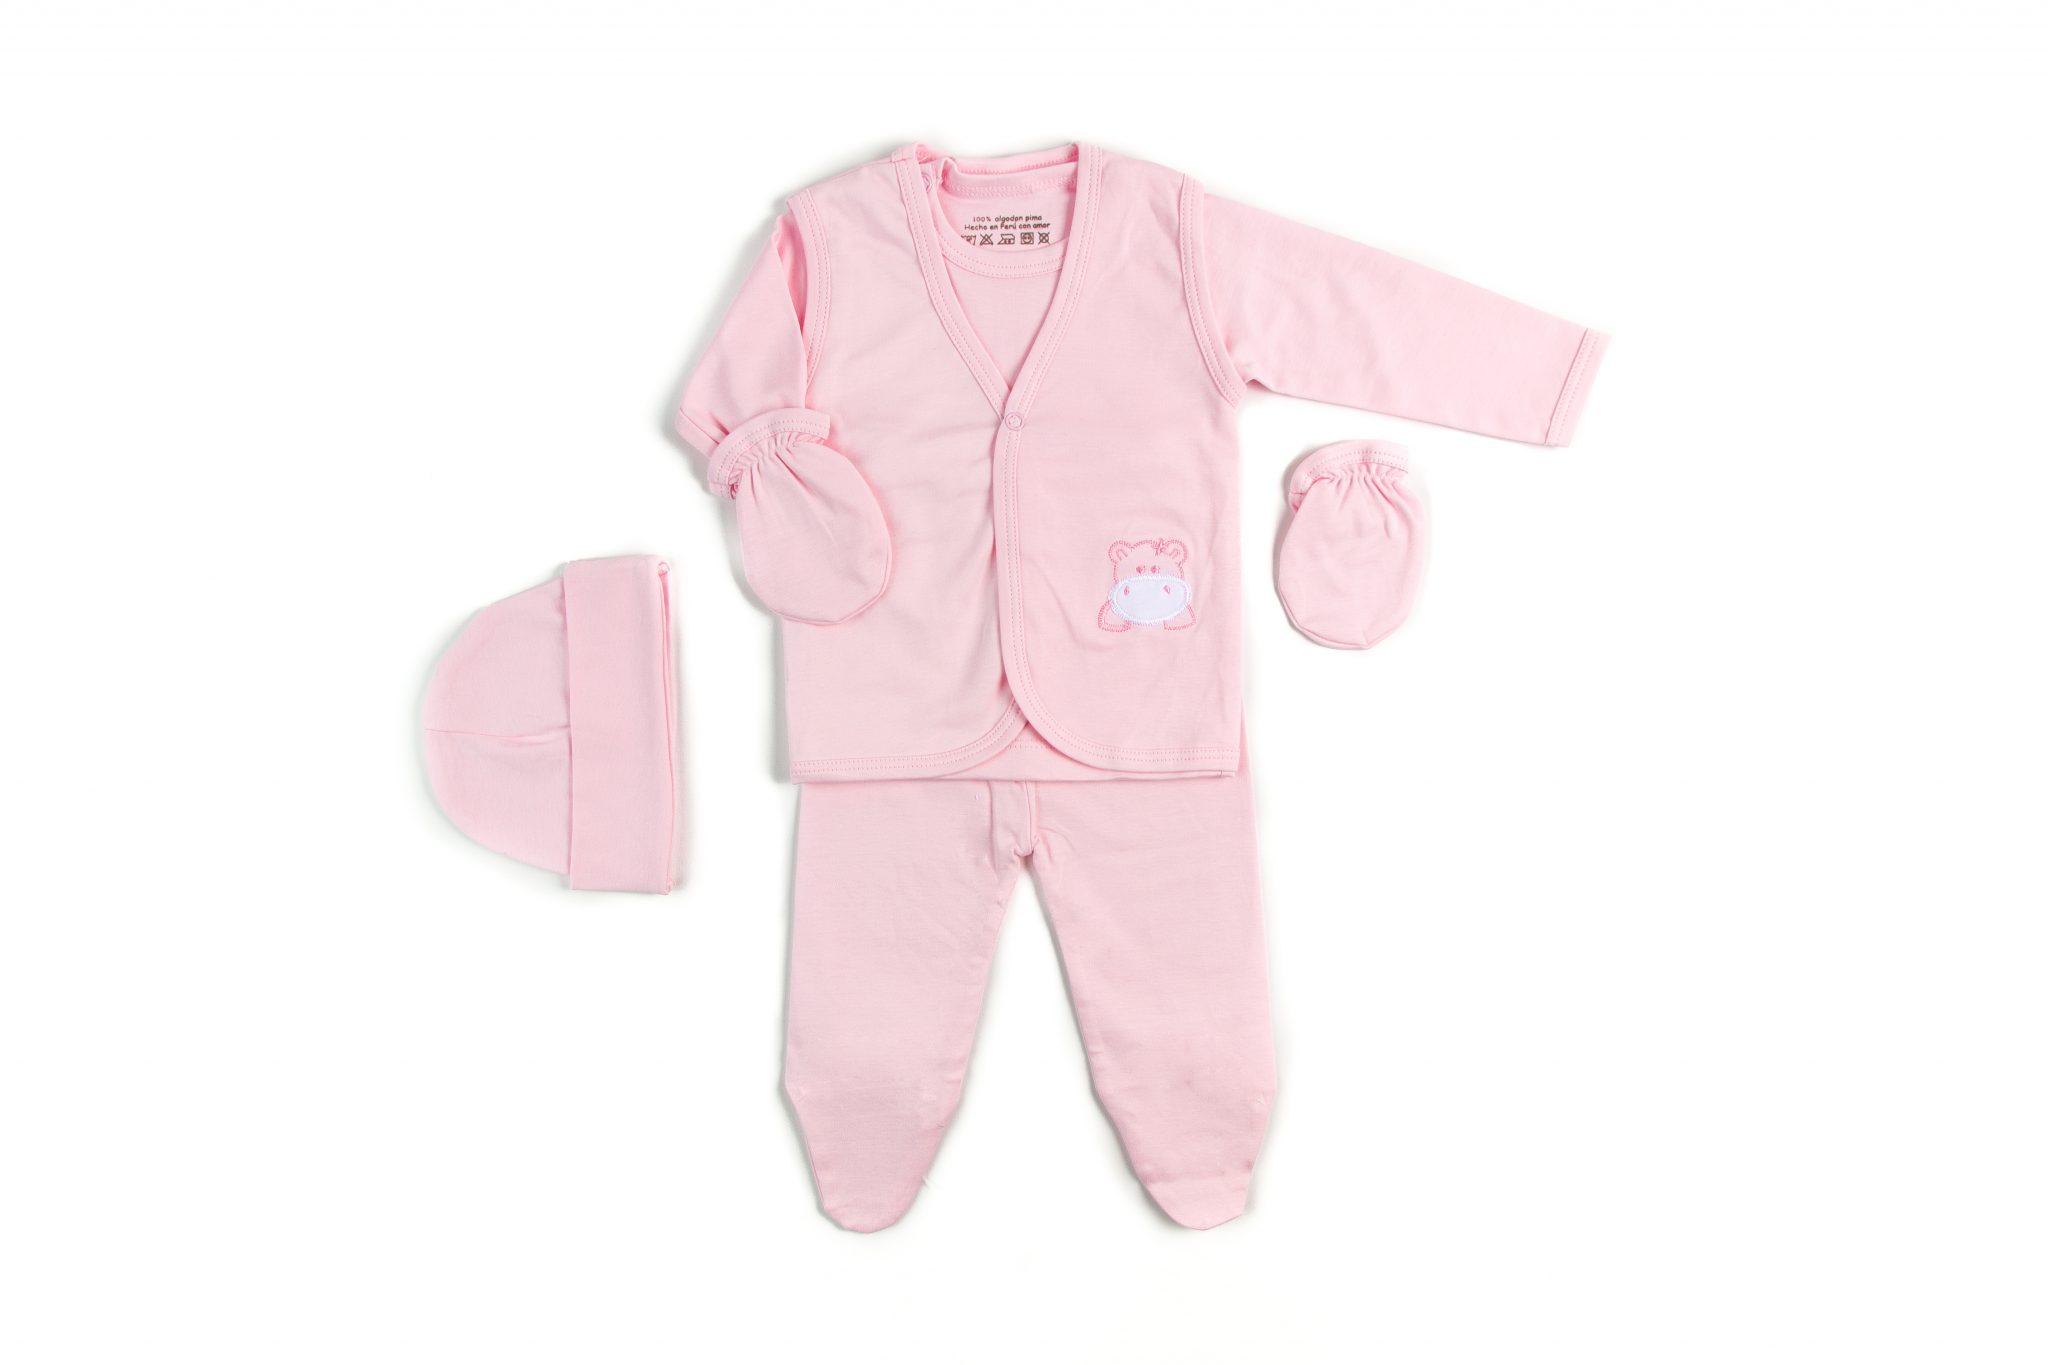 Ajuar Bordado Bebé 5 Piezas Hipopótamo Niña • Moonwear 8bfd4a78ce8d